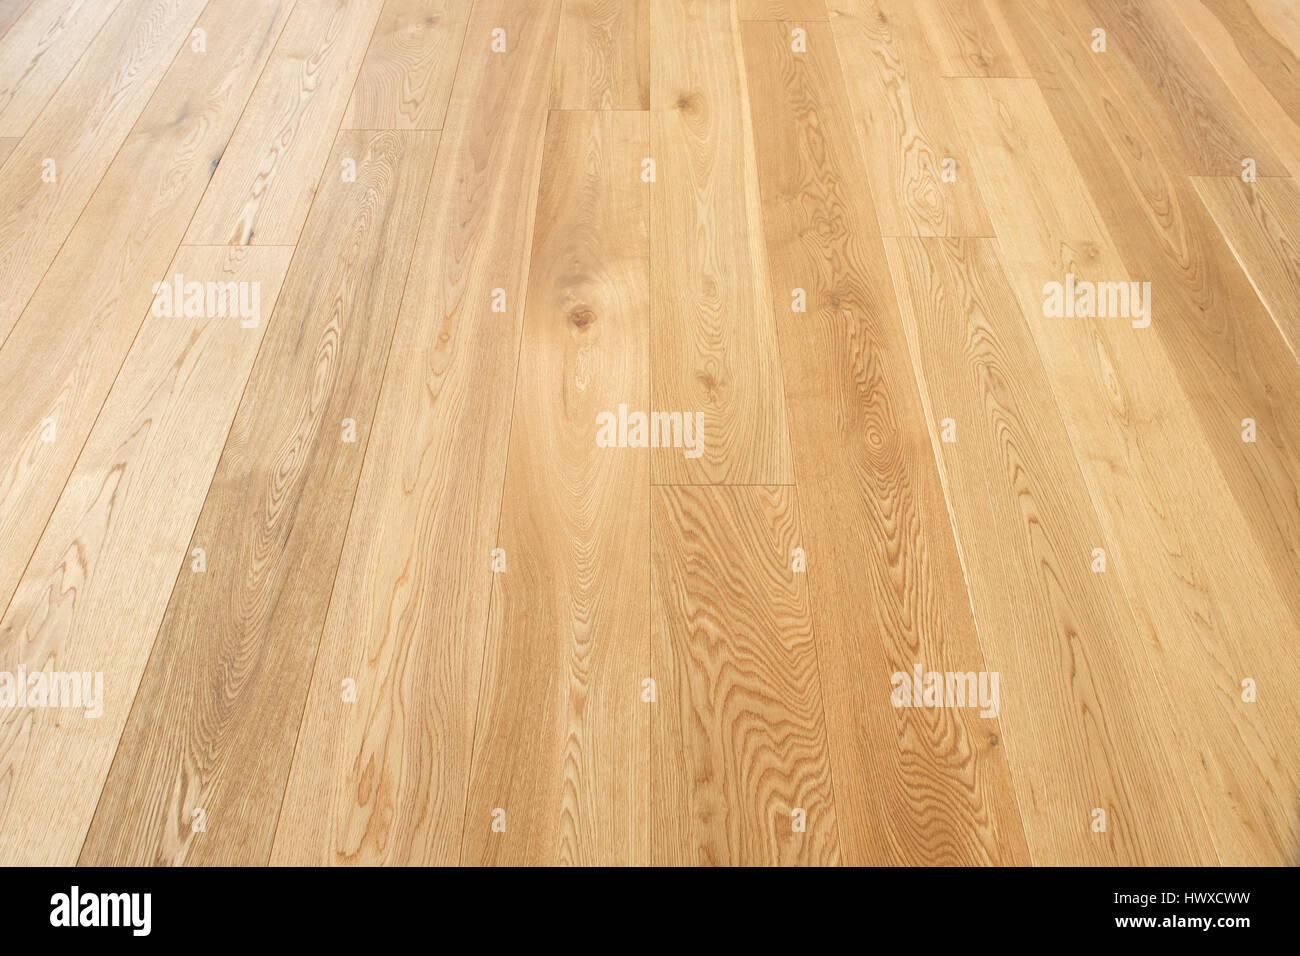 Parquet Floor Oak Wood Floor Closeup Stock Photo Alamy - Oak tree hardwood parquet flooring